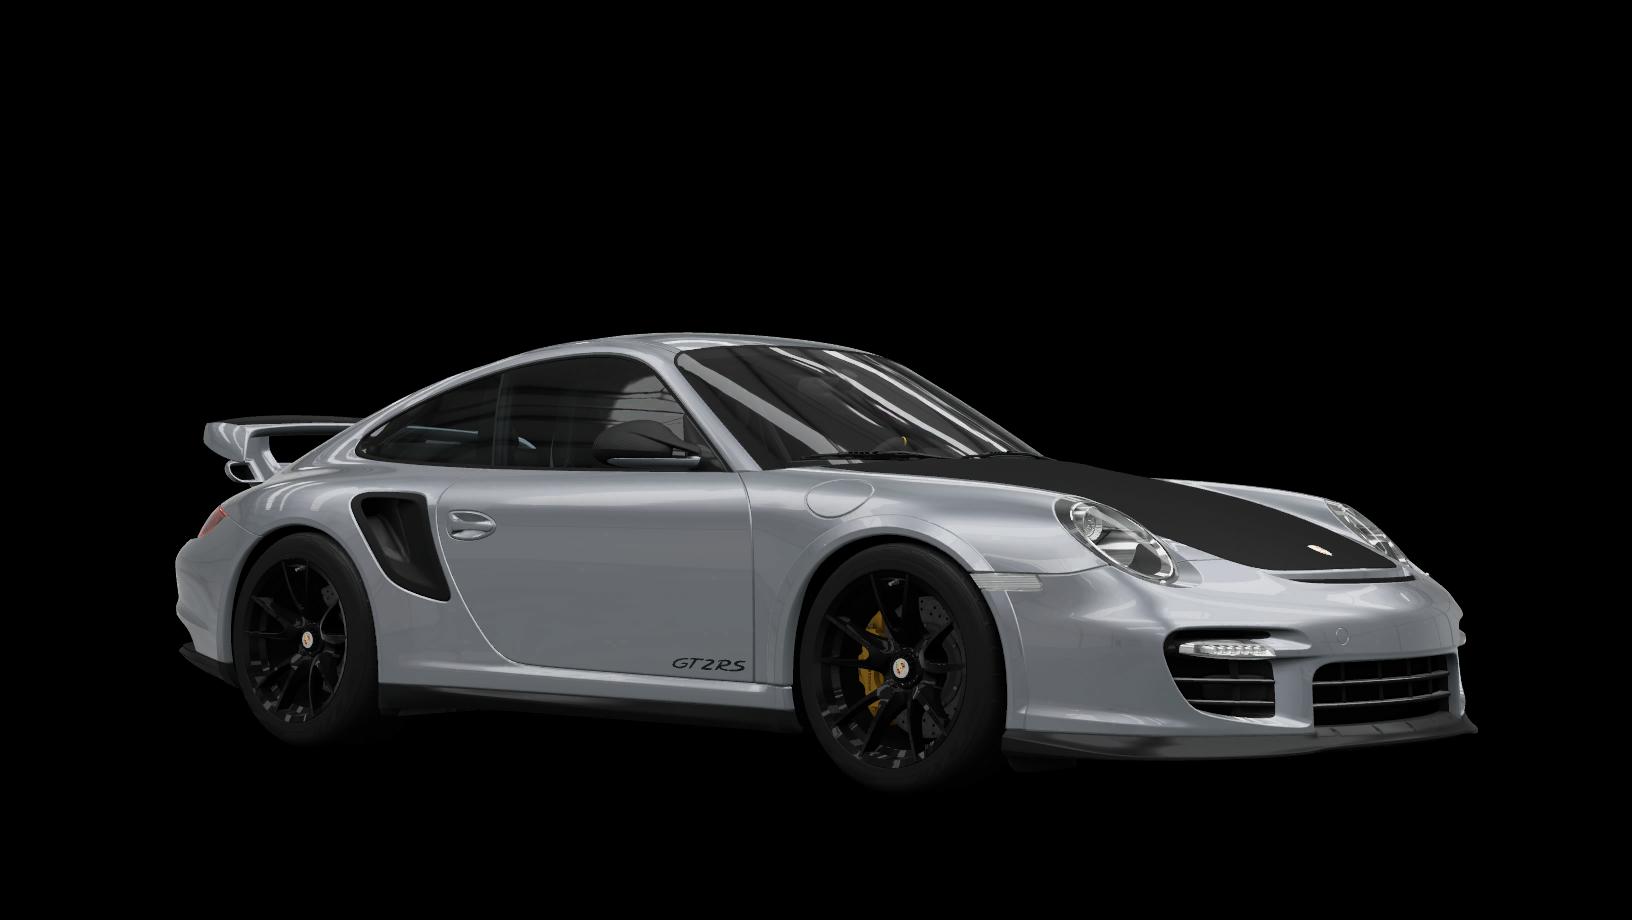 Porsche 911 Gt2 Rs 2012 Forza Wiki Fandom